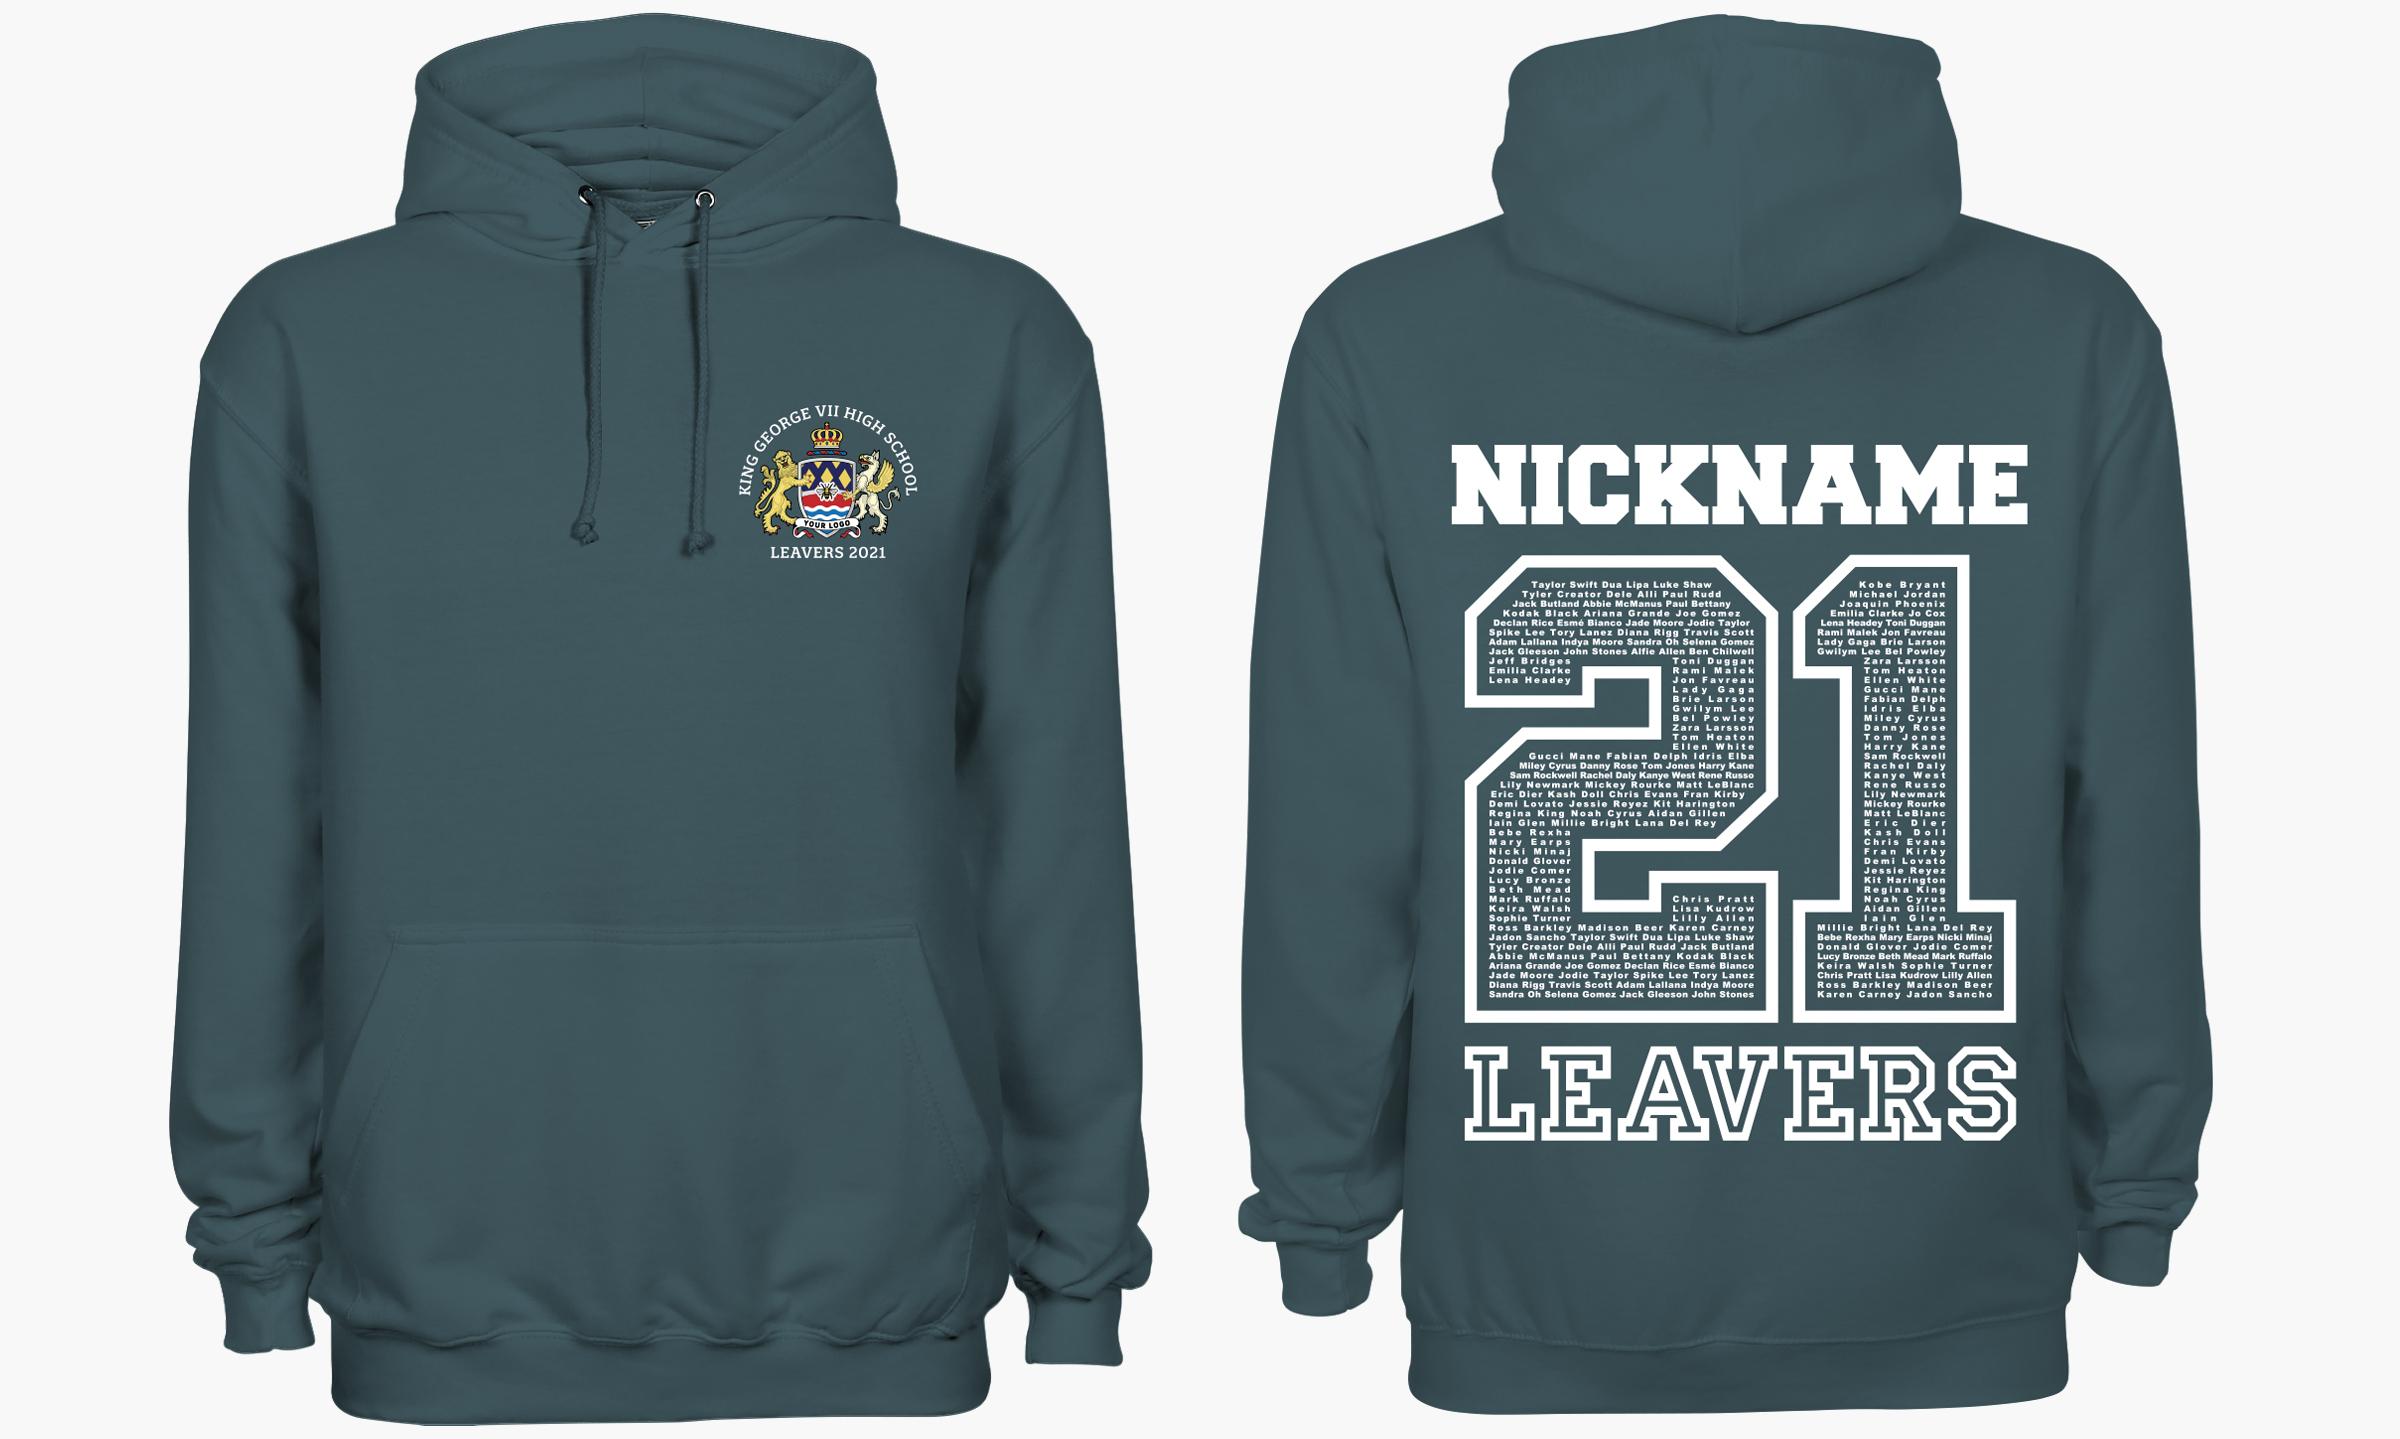 The classic leavers hoodie